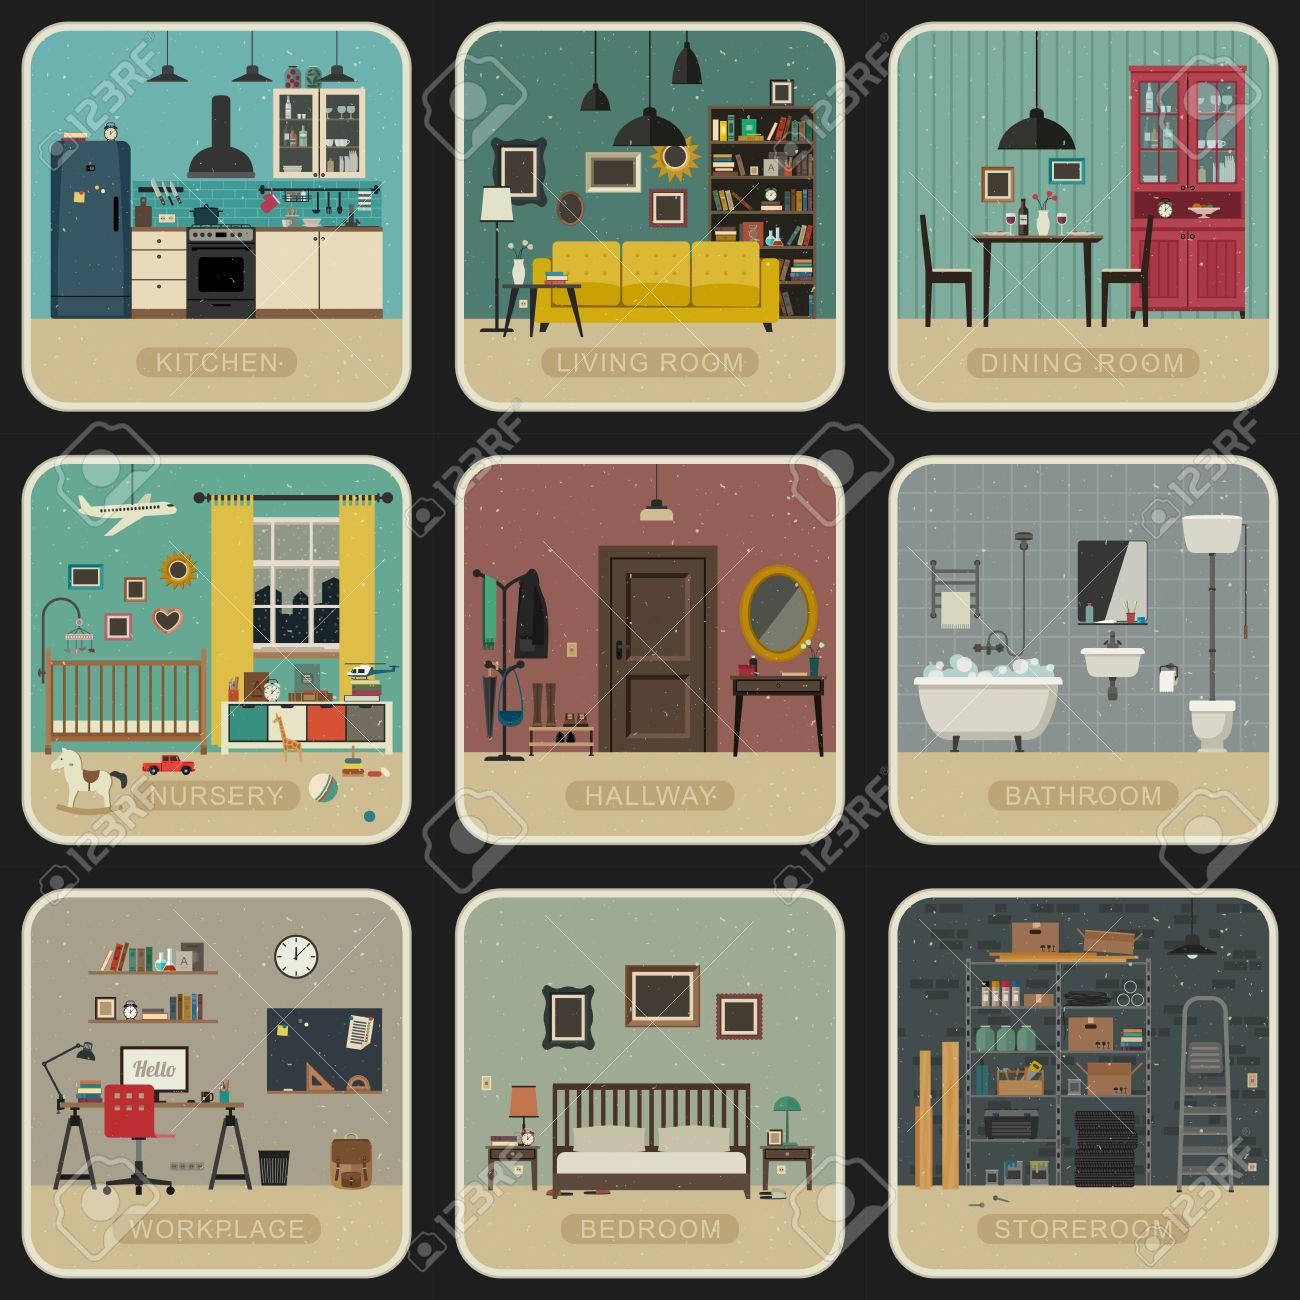 Set Of Interior Rooms In Flat Style Vintage Illustrations Bathroom Living Room